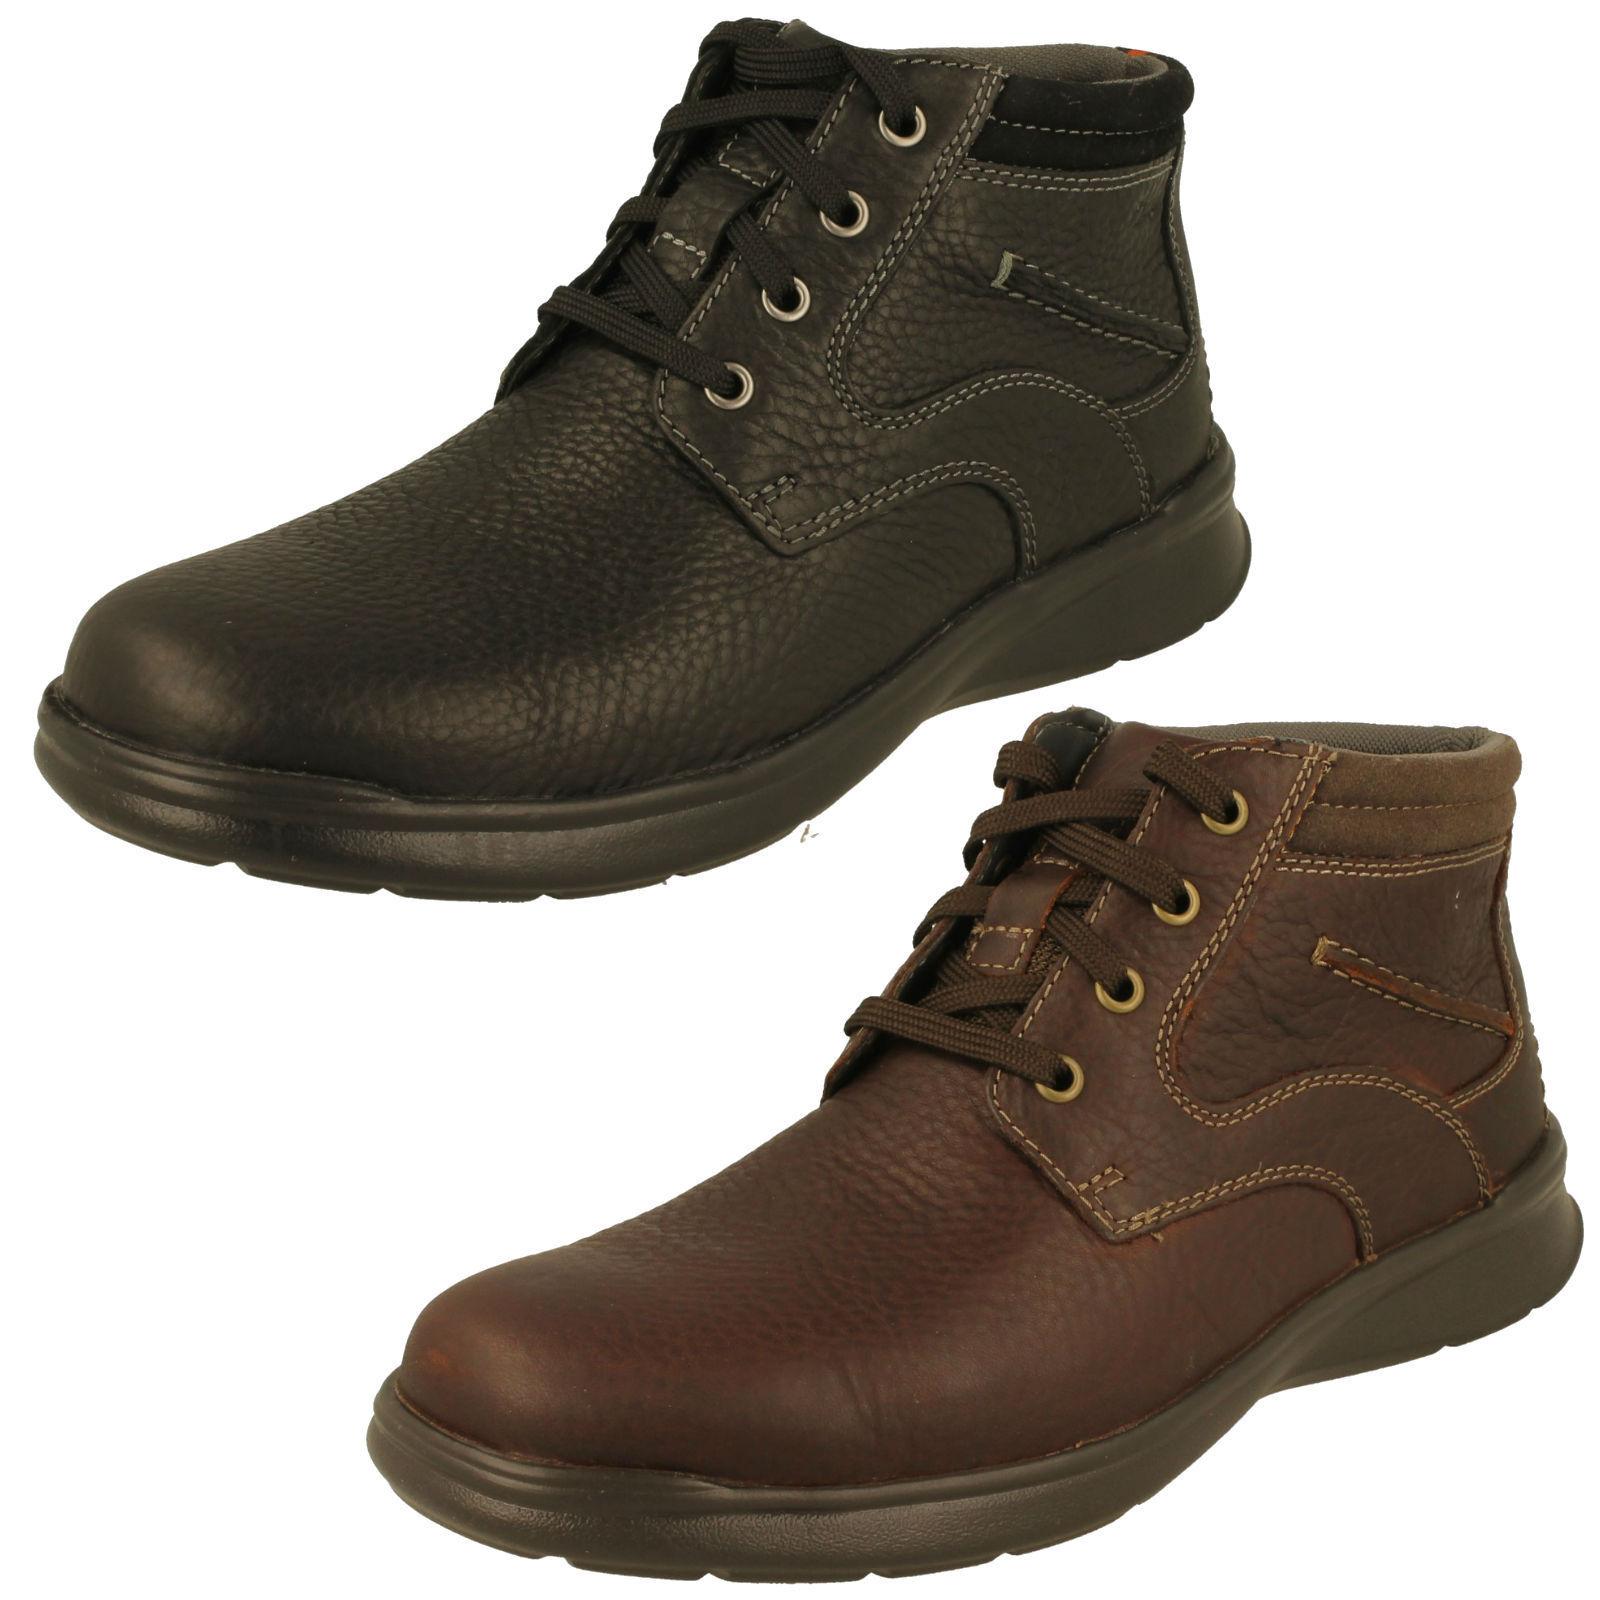 Hombre Clarks botas - cotrell Subir